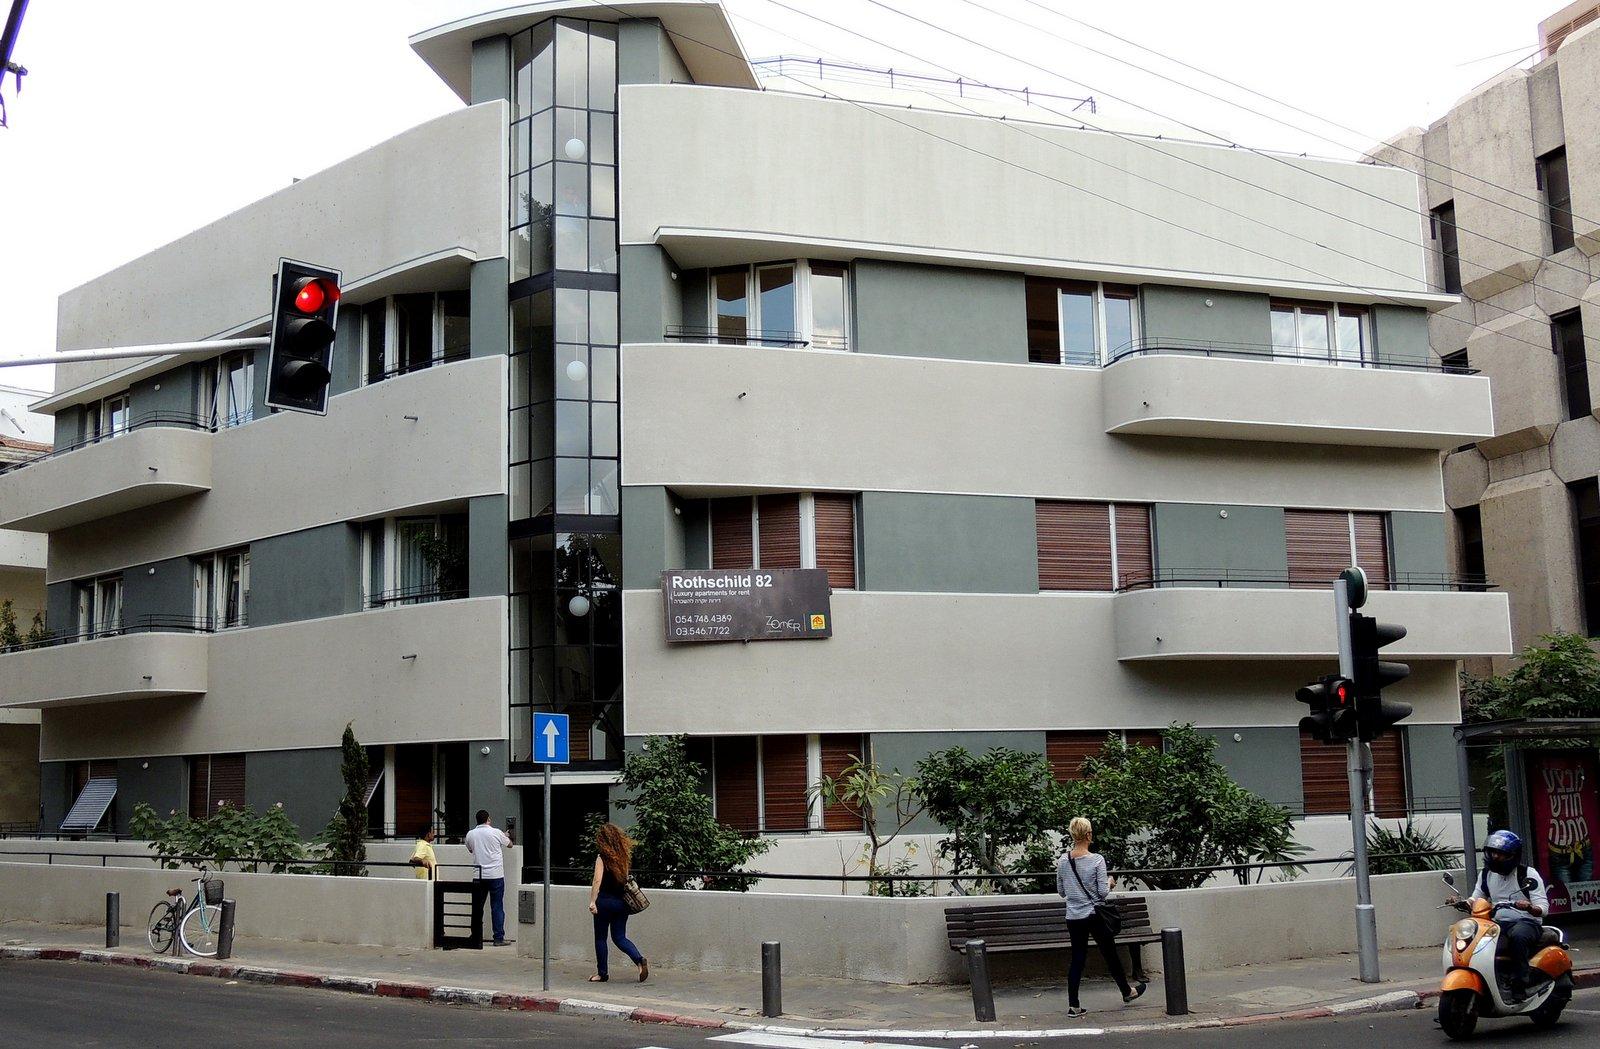 Rothschild Boulevard 82